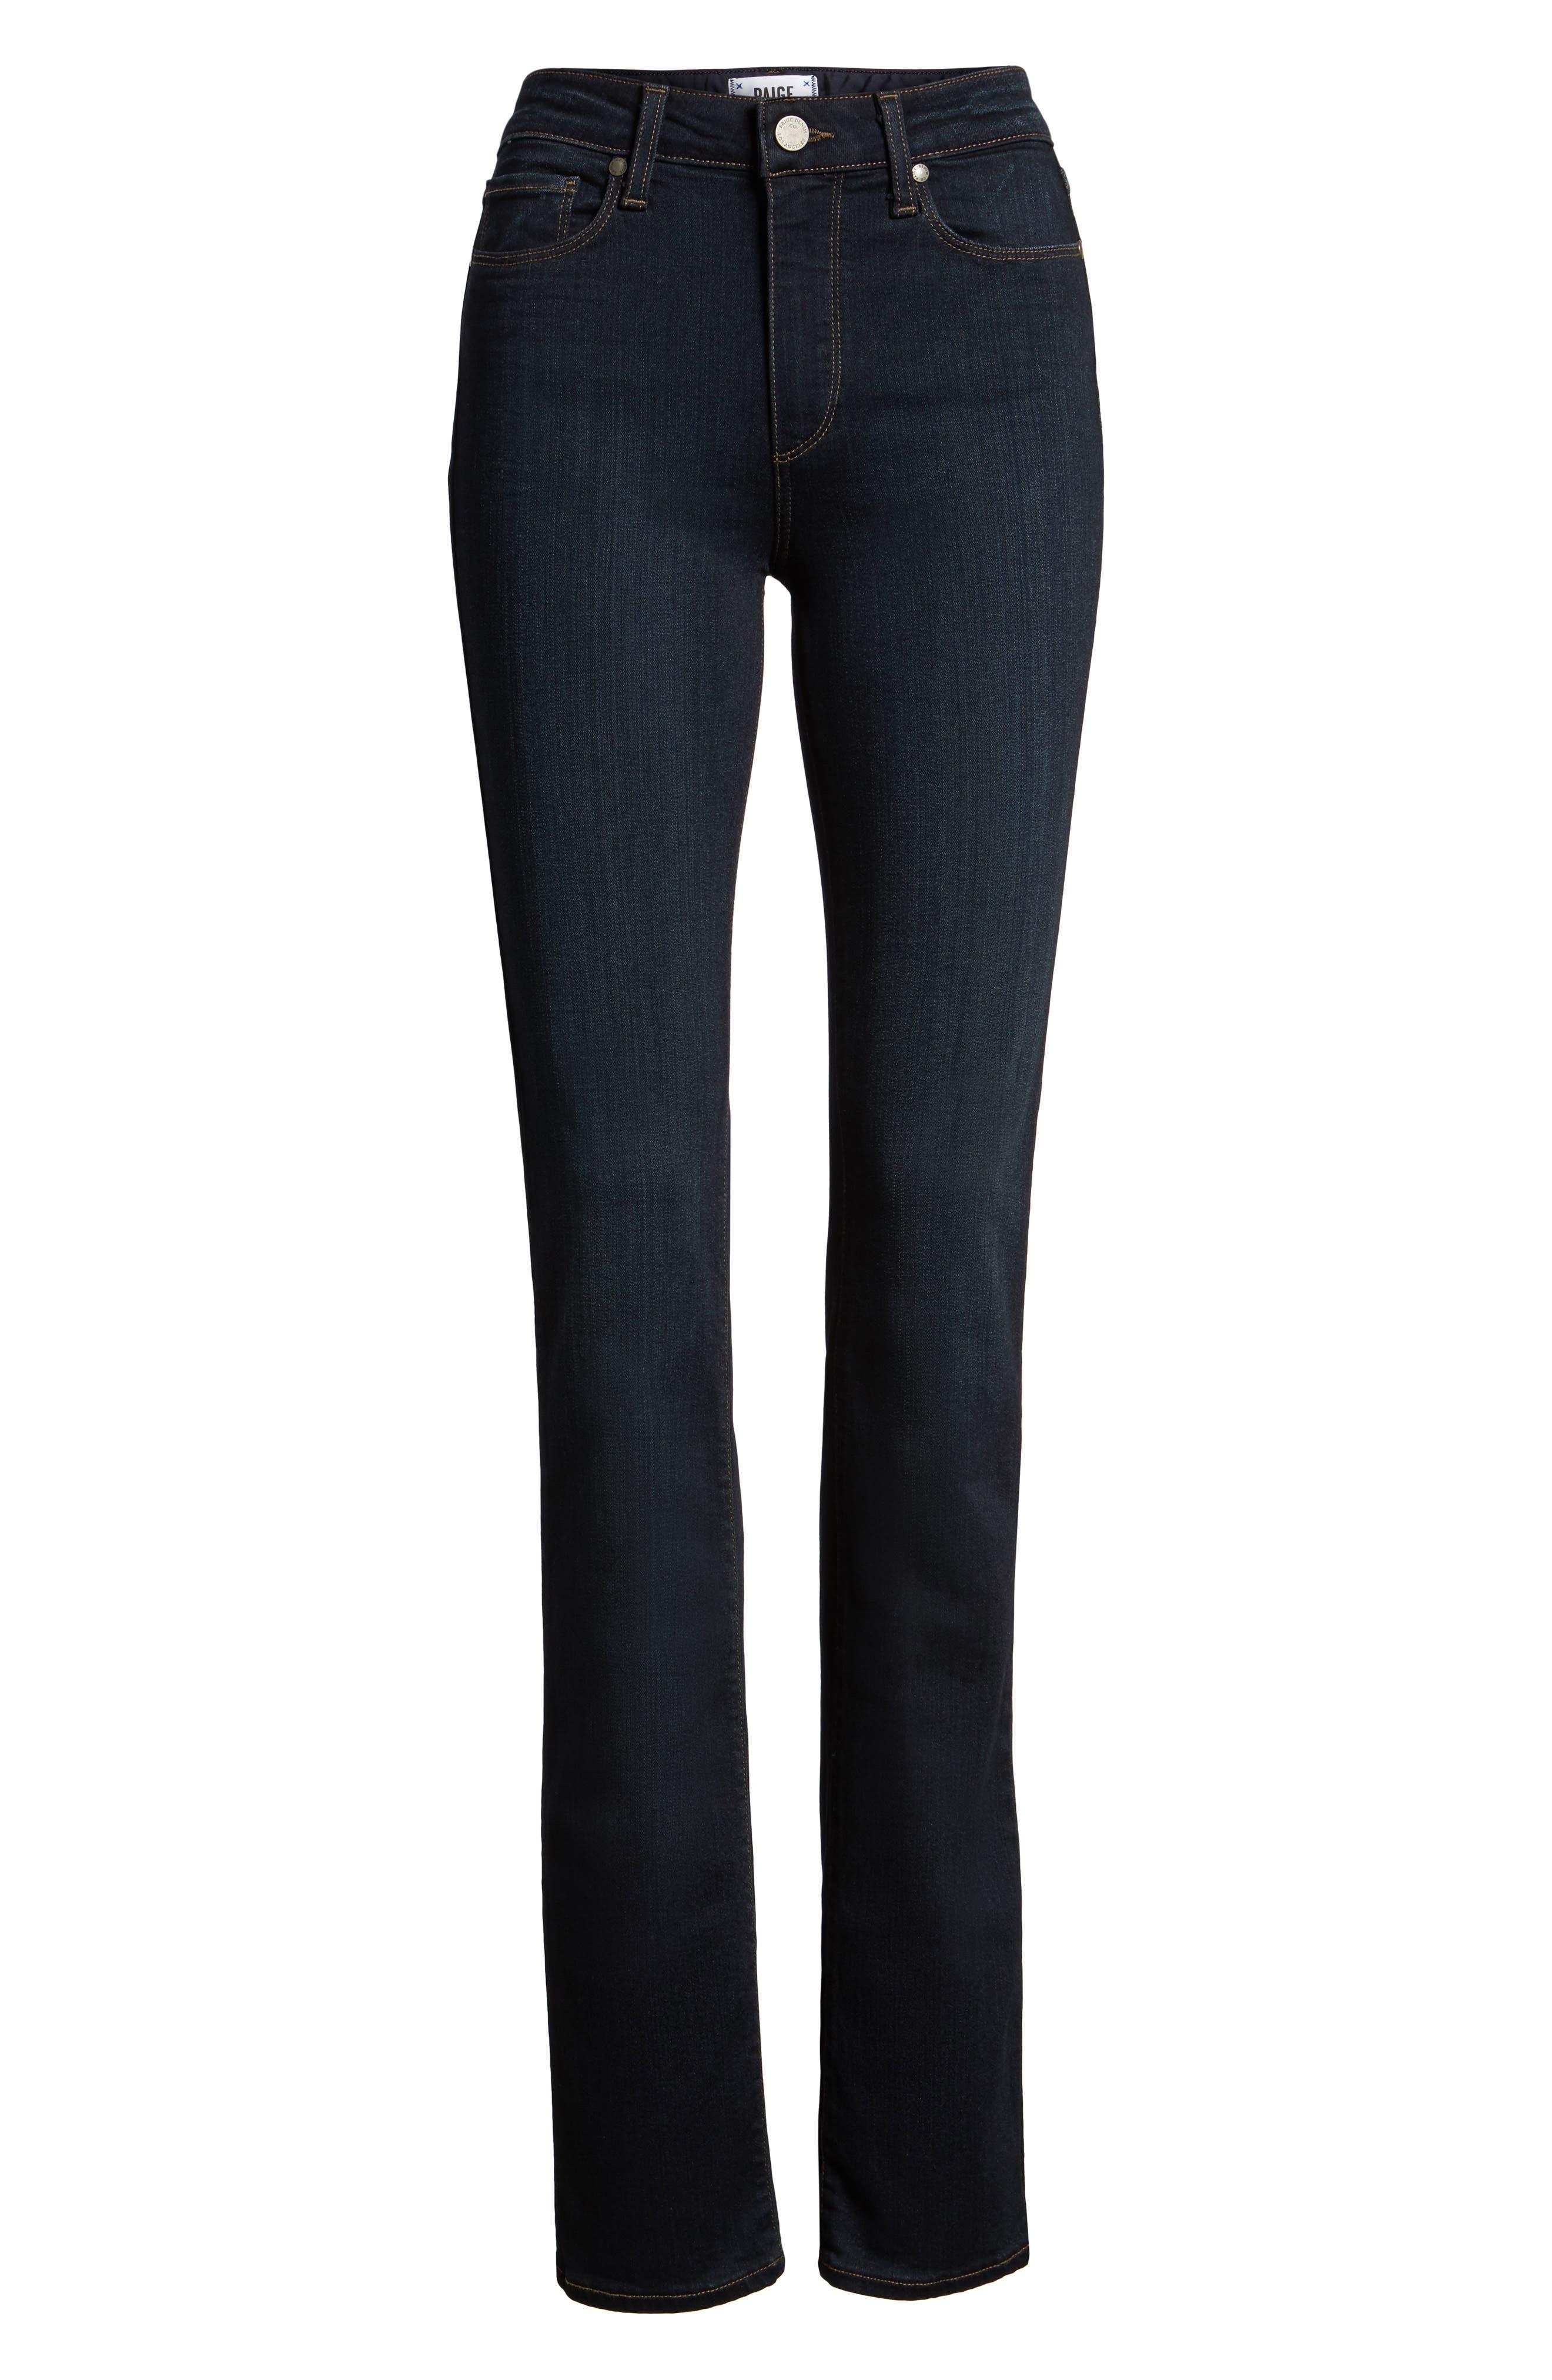 Transcend - Hoxton High Waist Straight Jeans,                             Main thumbnail 1, color,                             MONA